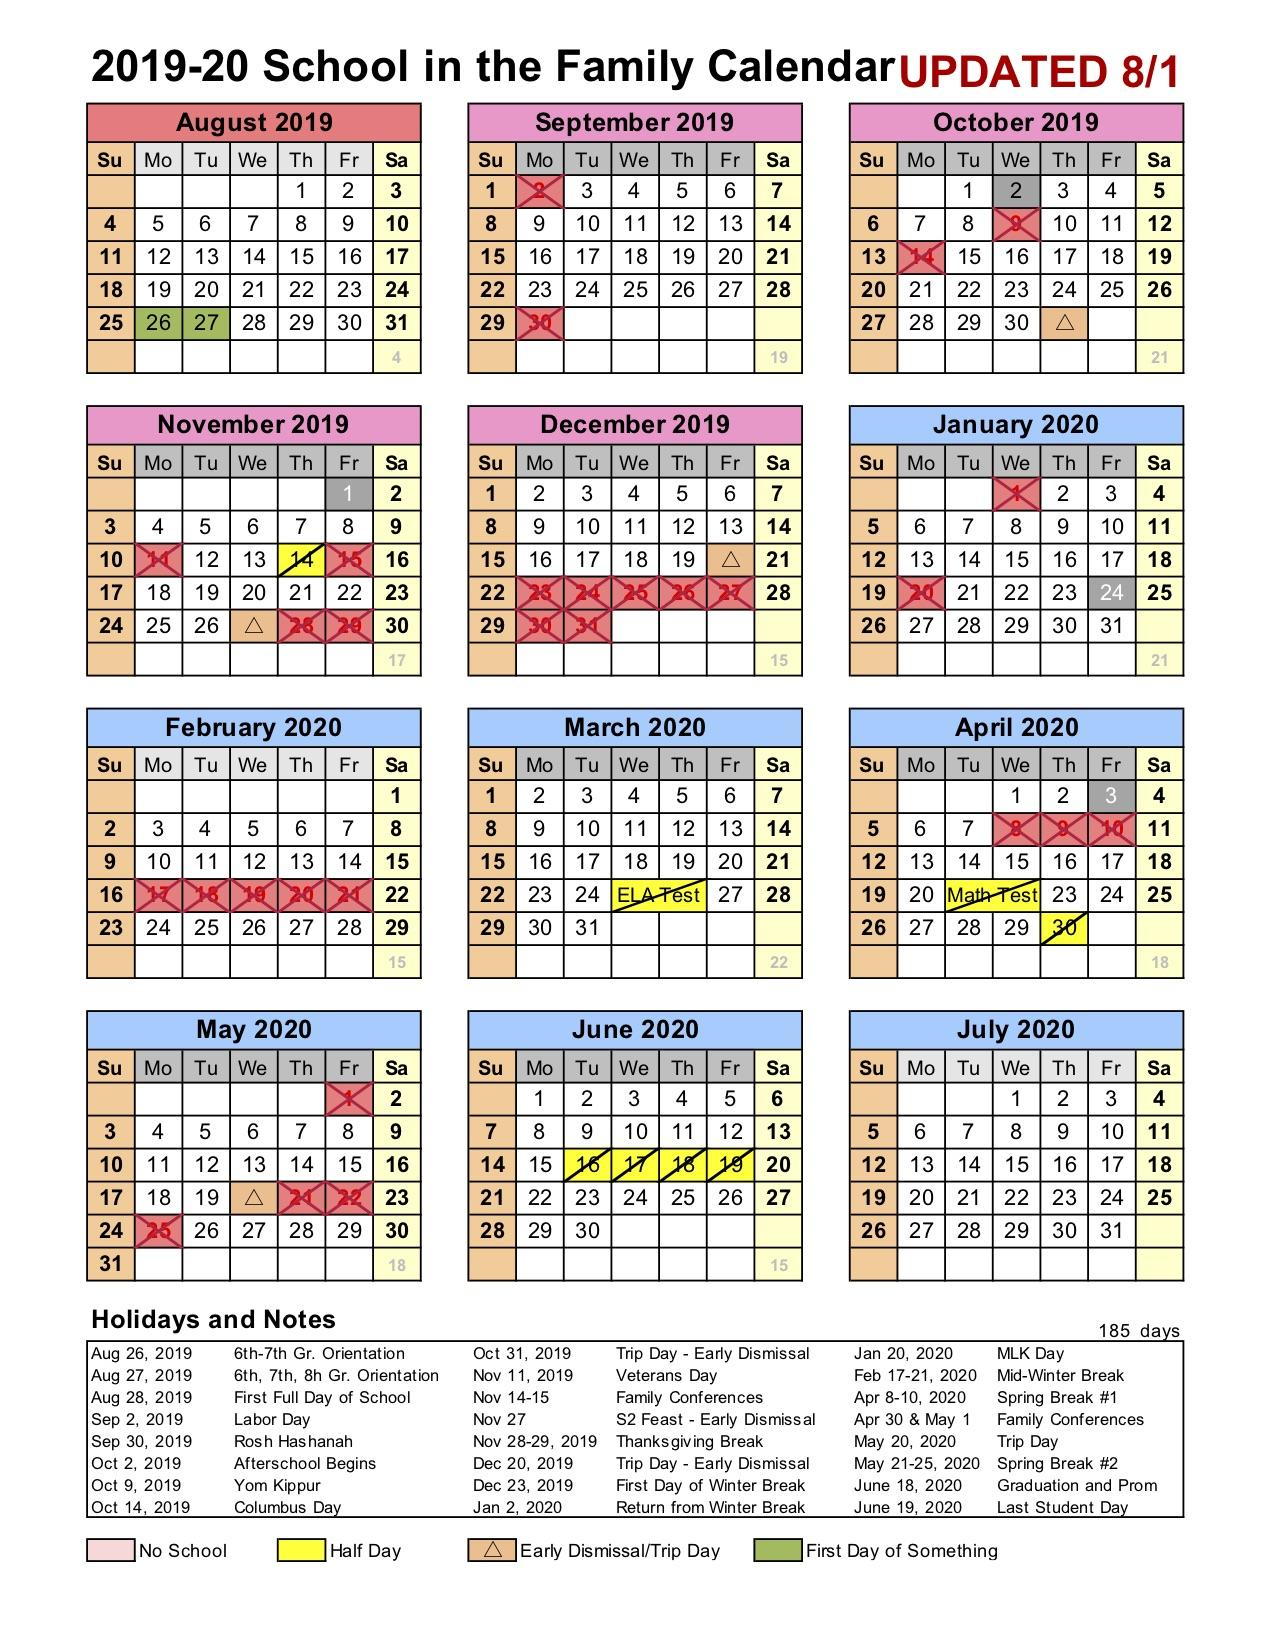 stony brook spring 2020 calendar